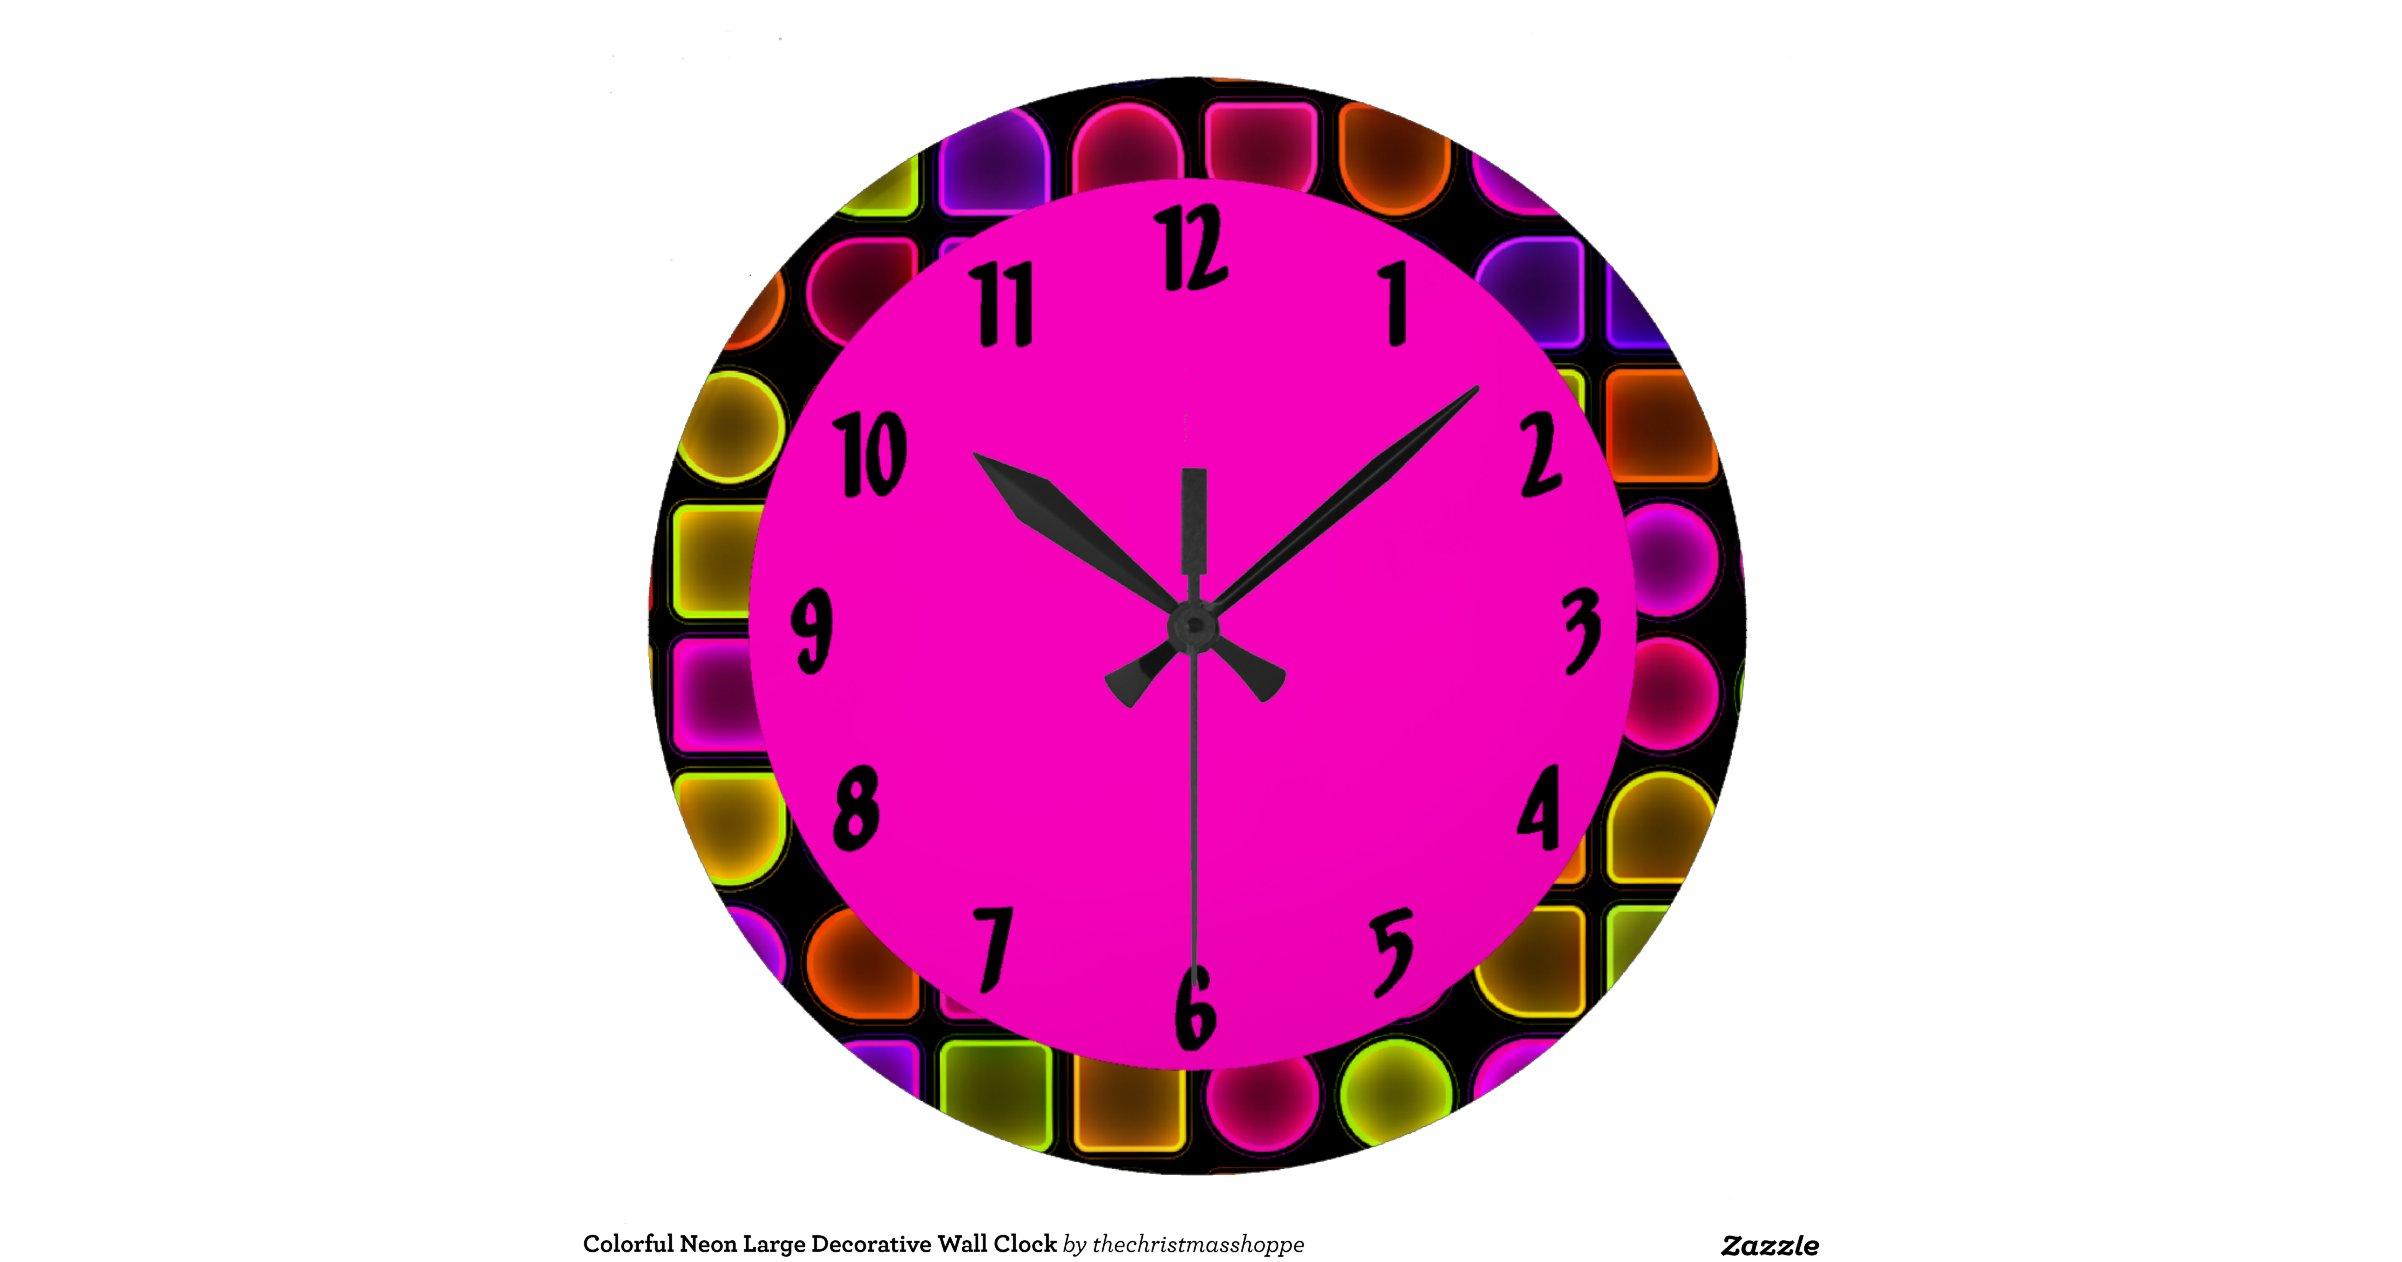 grande horloge murale d corative au n on color e zazzle. Black Bedroom Furniture Sets. Home Design Ideas